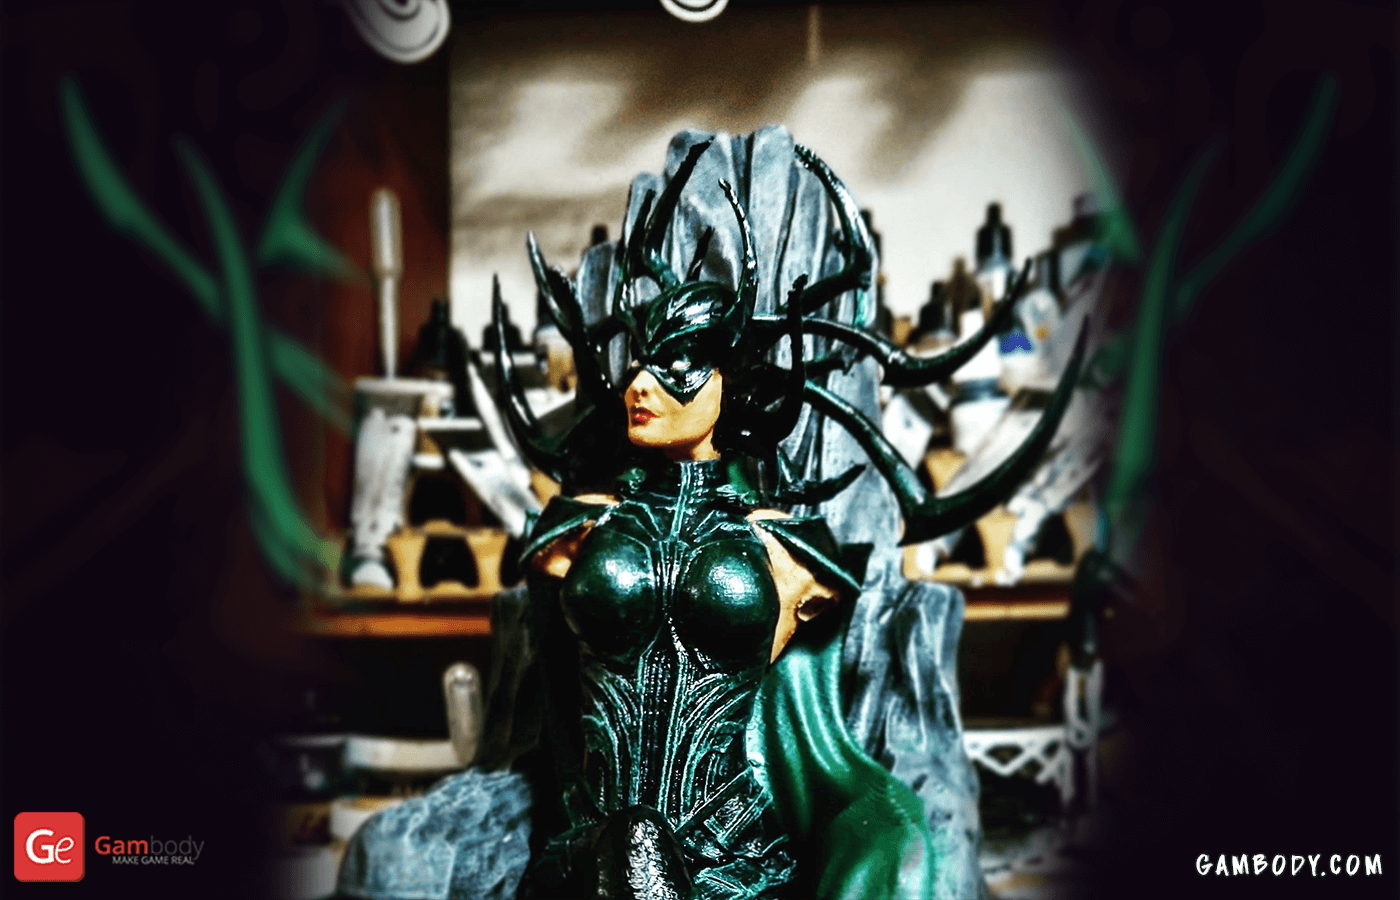 Hela on Throne 3D Printing Figurine Photo 2